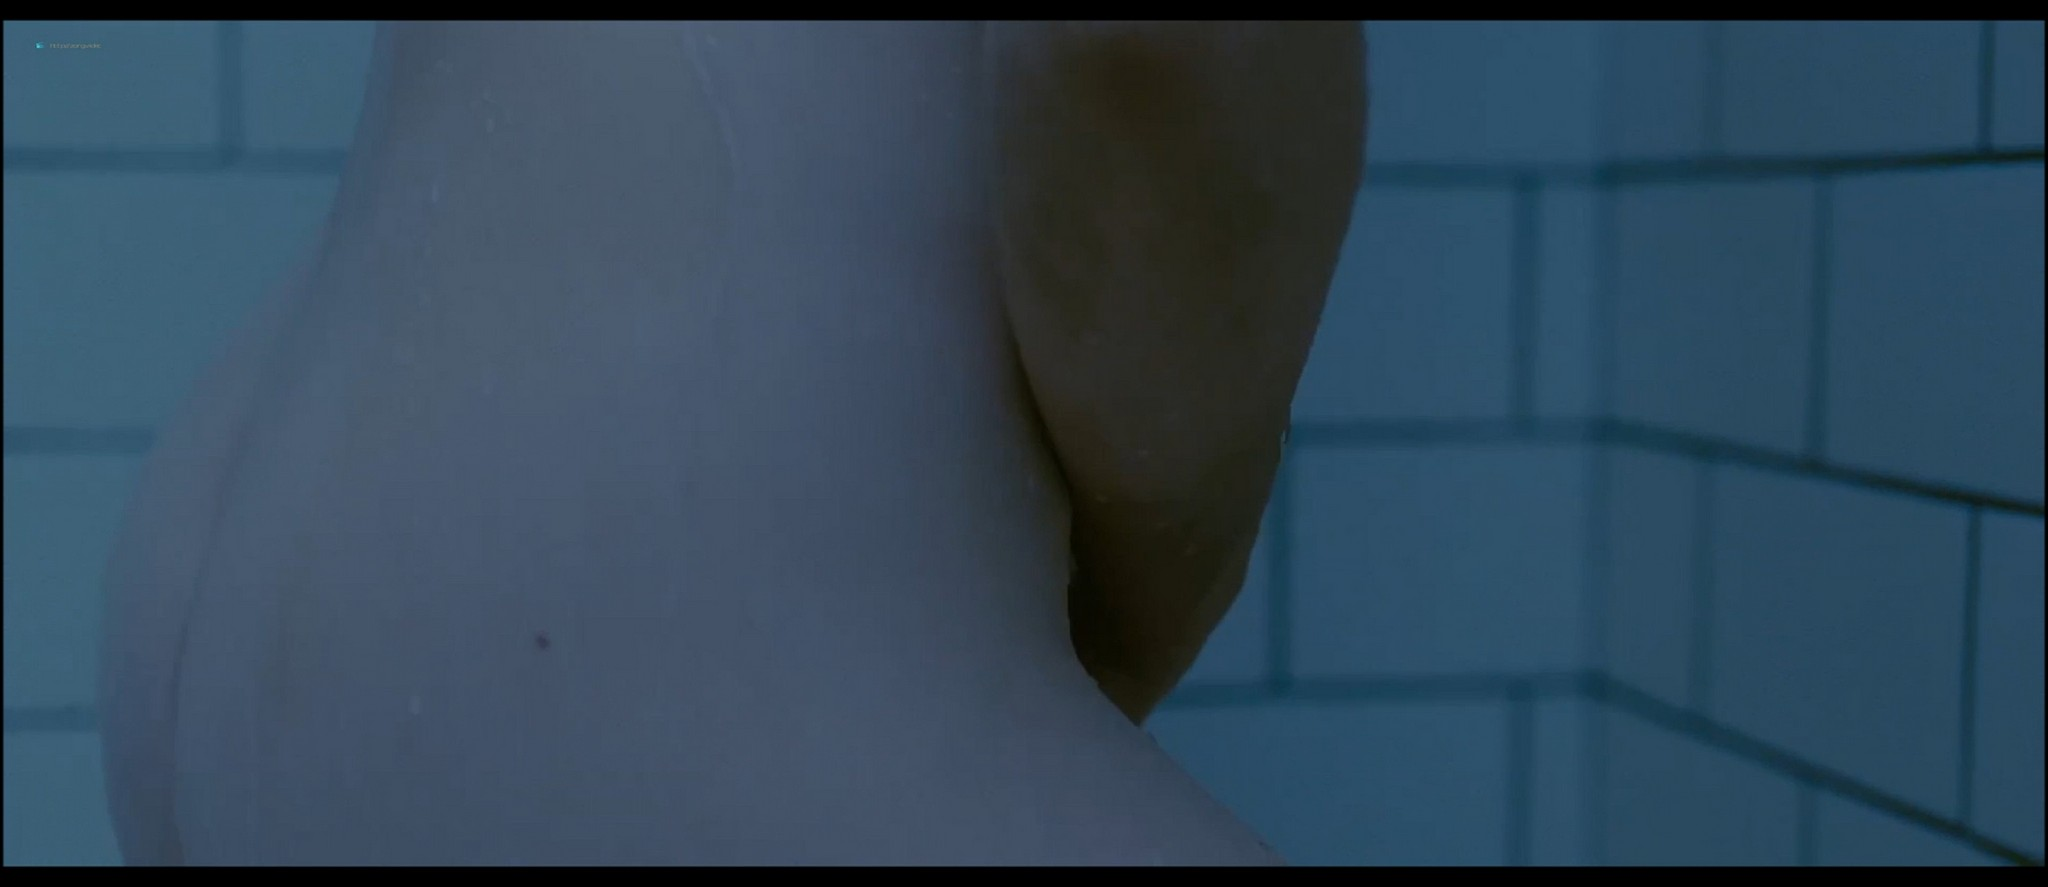 Mia Wasikowska nude nipple peak and butt while masturbating nude in the shower - Stoker (2013) HD 1080p BluRay (5)